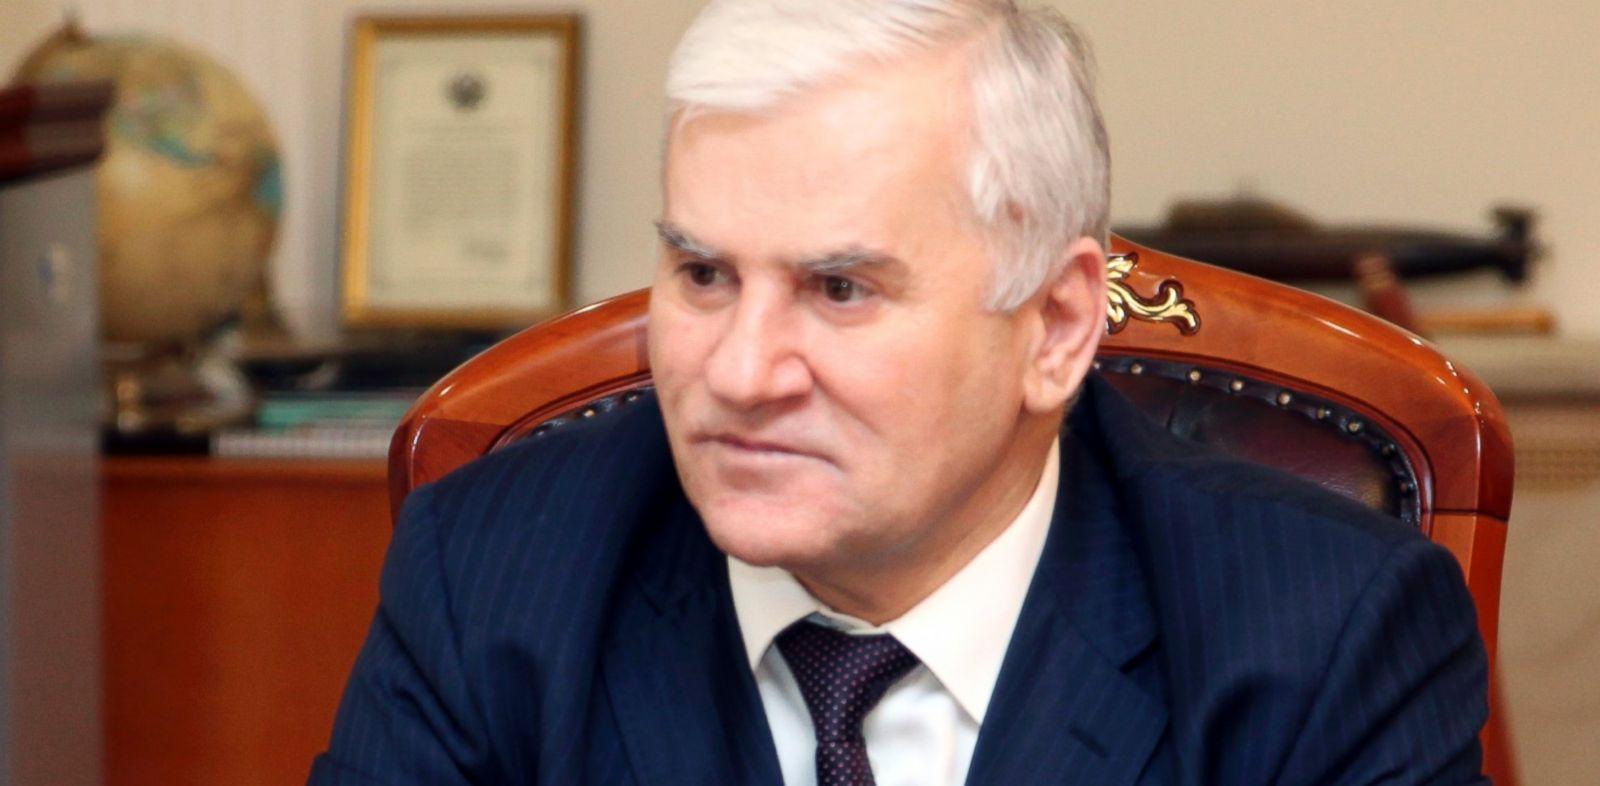 PHOTO: Mayor of Makhachkala Said Amirov speaks at his office in Makhachkala April 25, 2013.